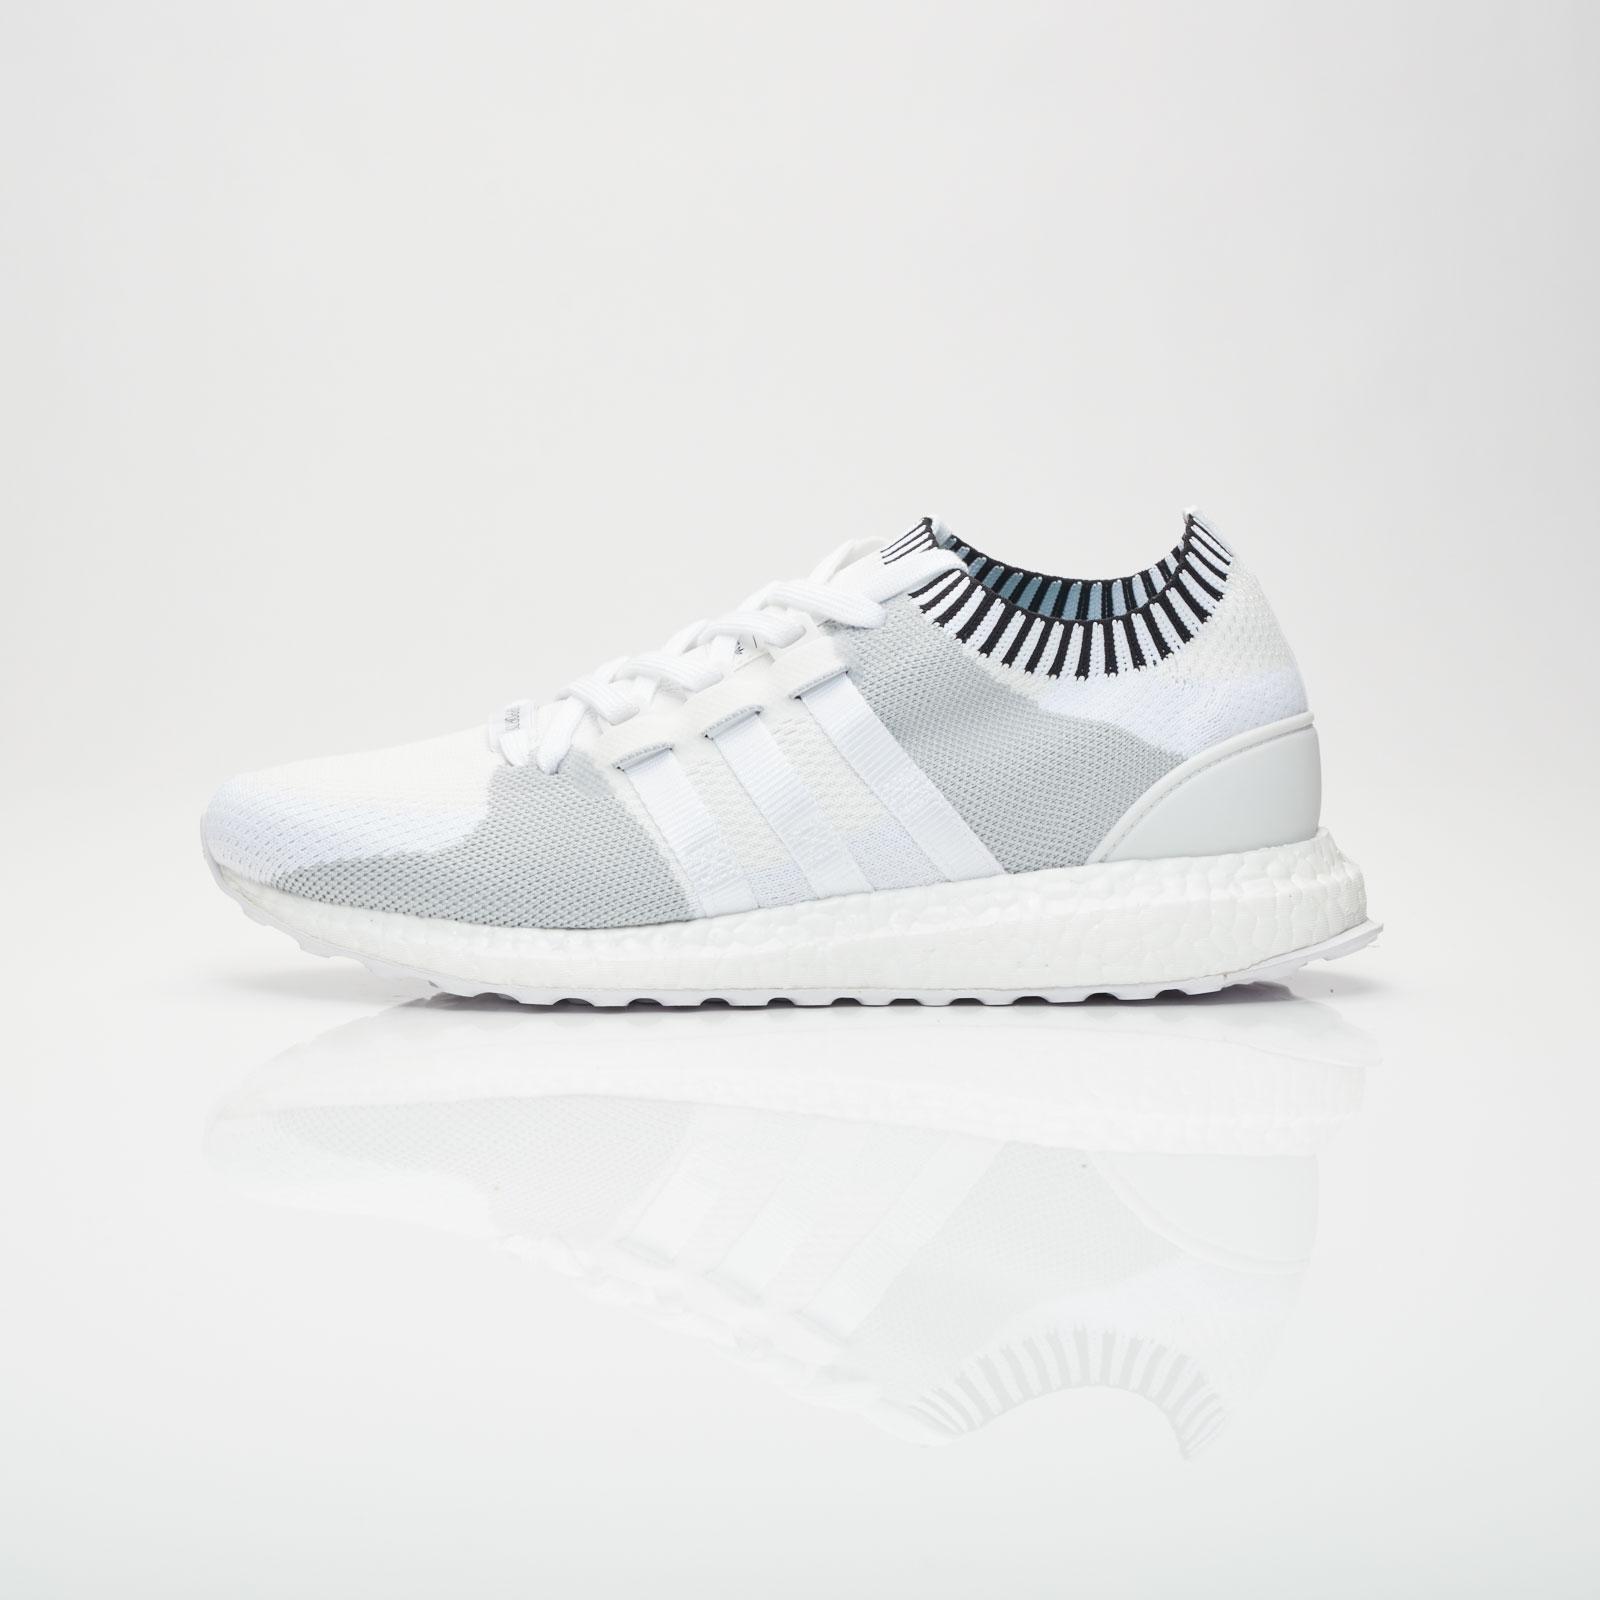 d9ae7eee3b31 adidas EQT Support Ultra PK - Bb1243 - Sneakersnstuff